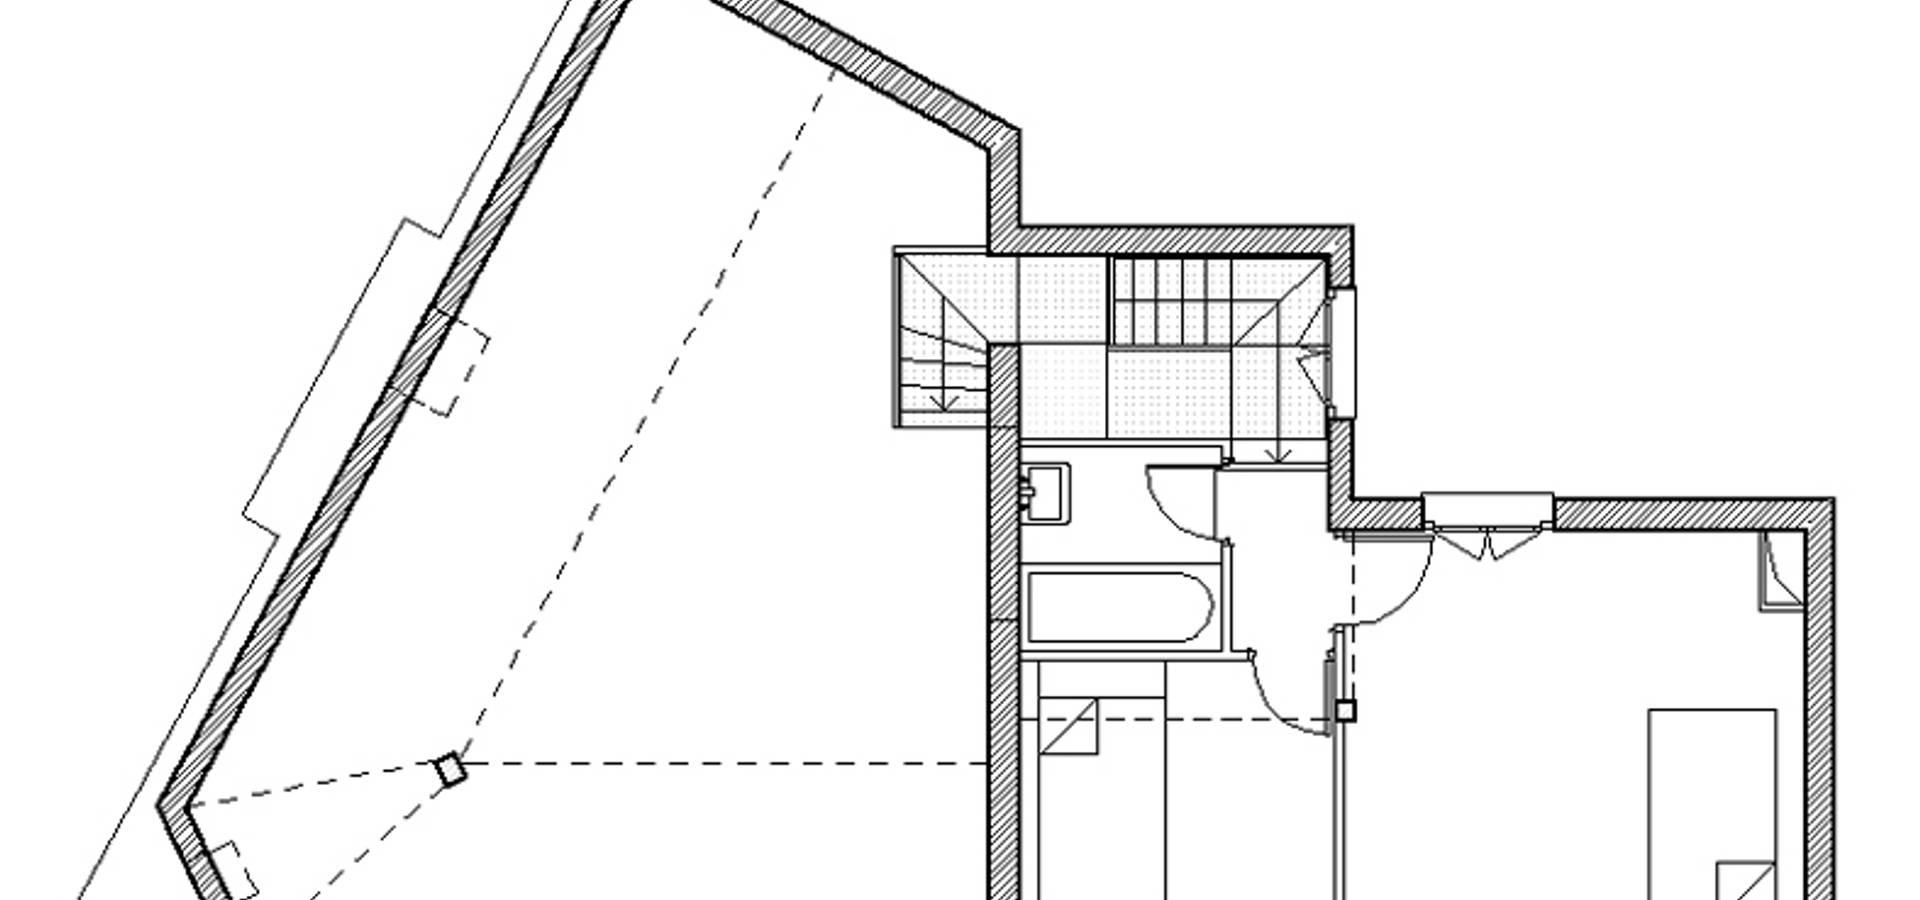 clermont architectes